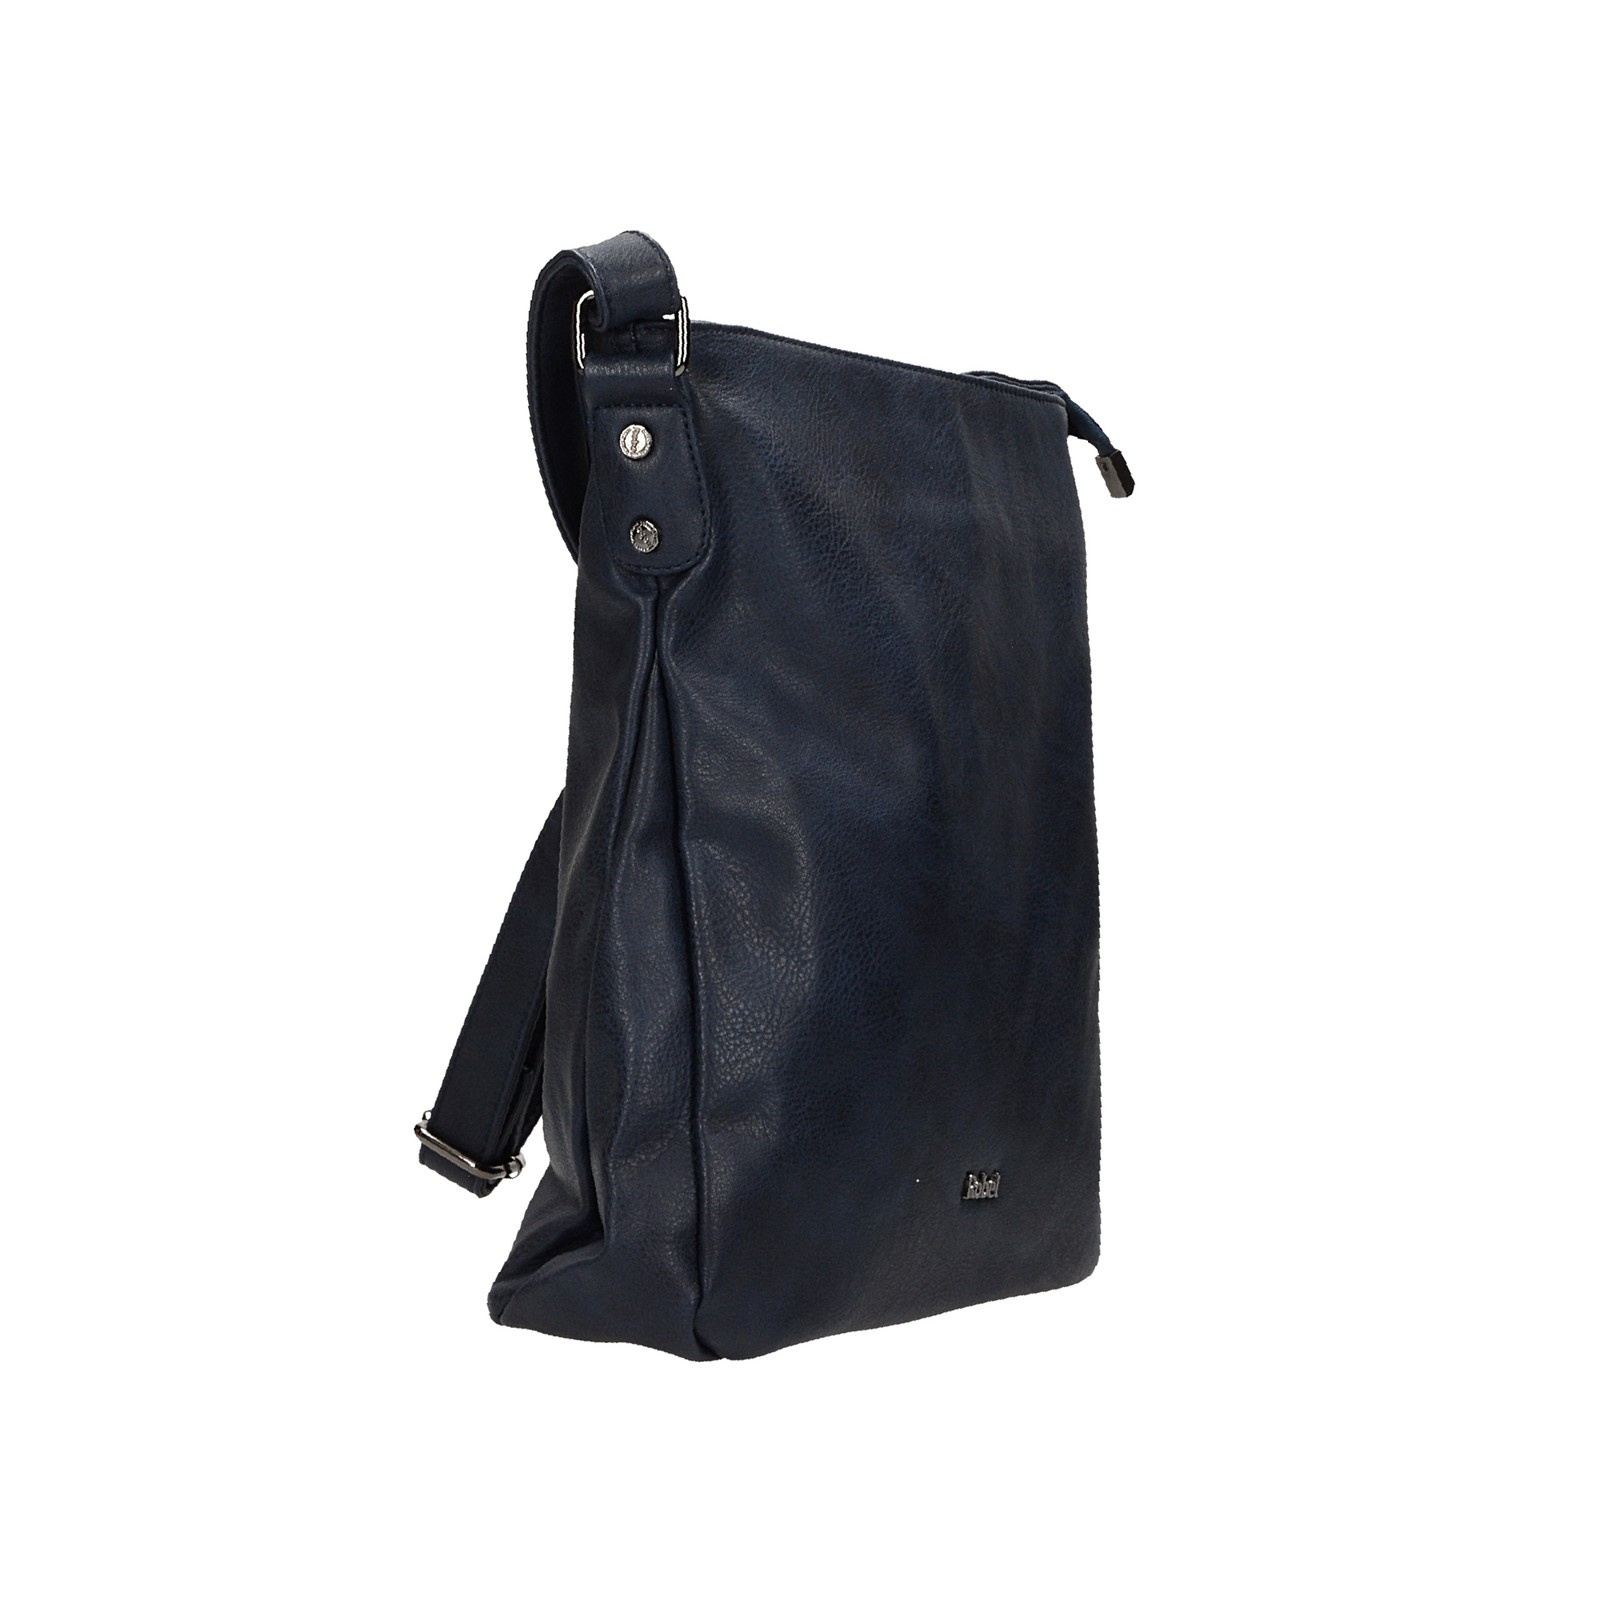 Robel dámska kabelka - tmavomodrá